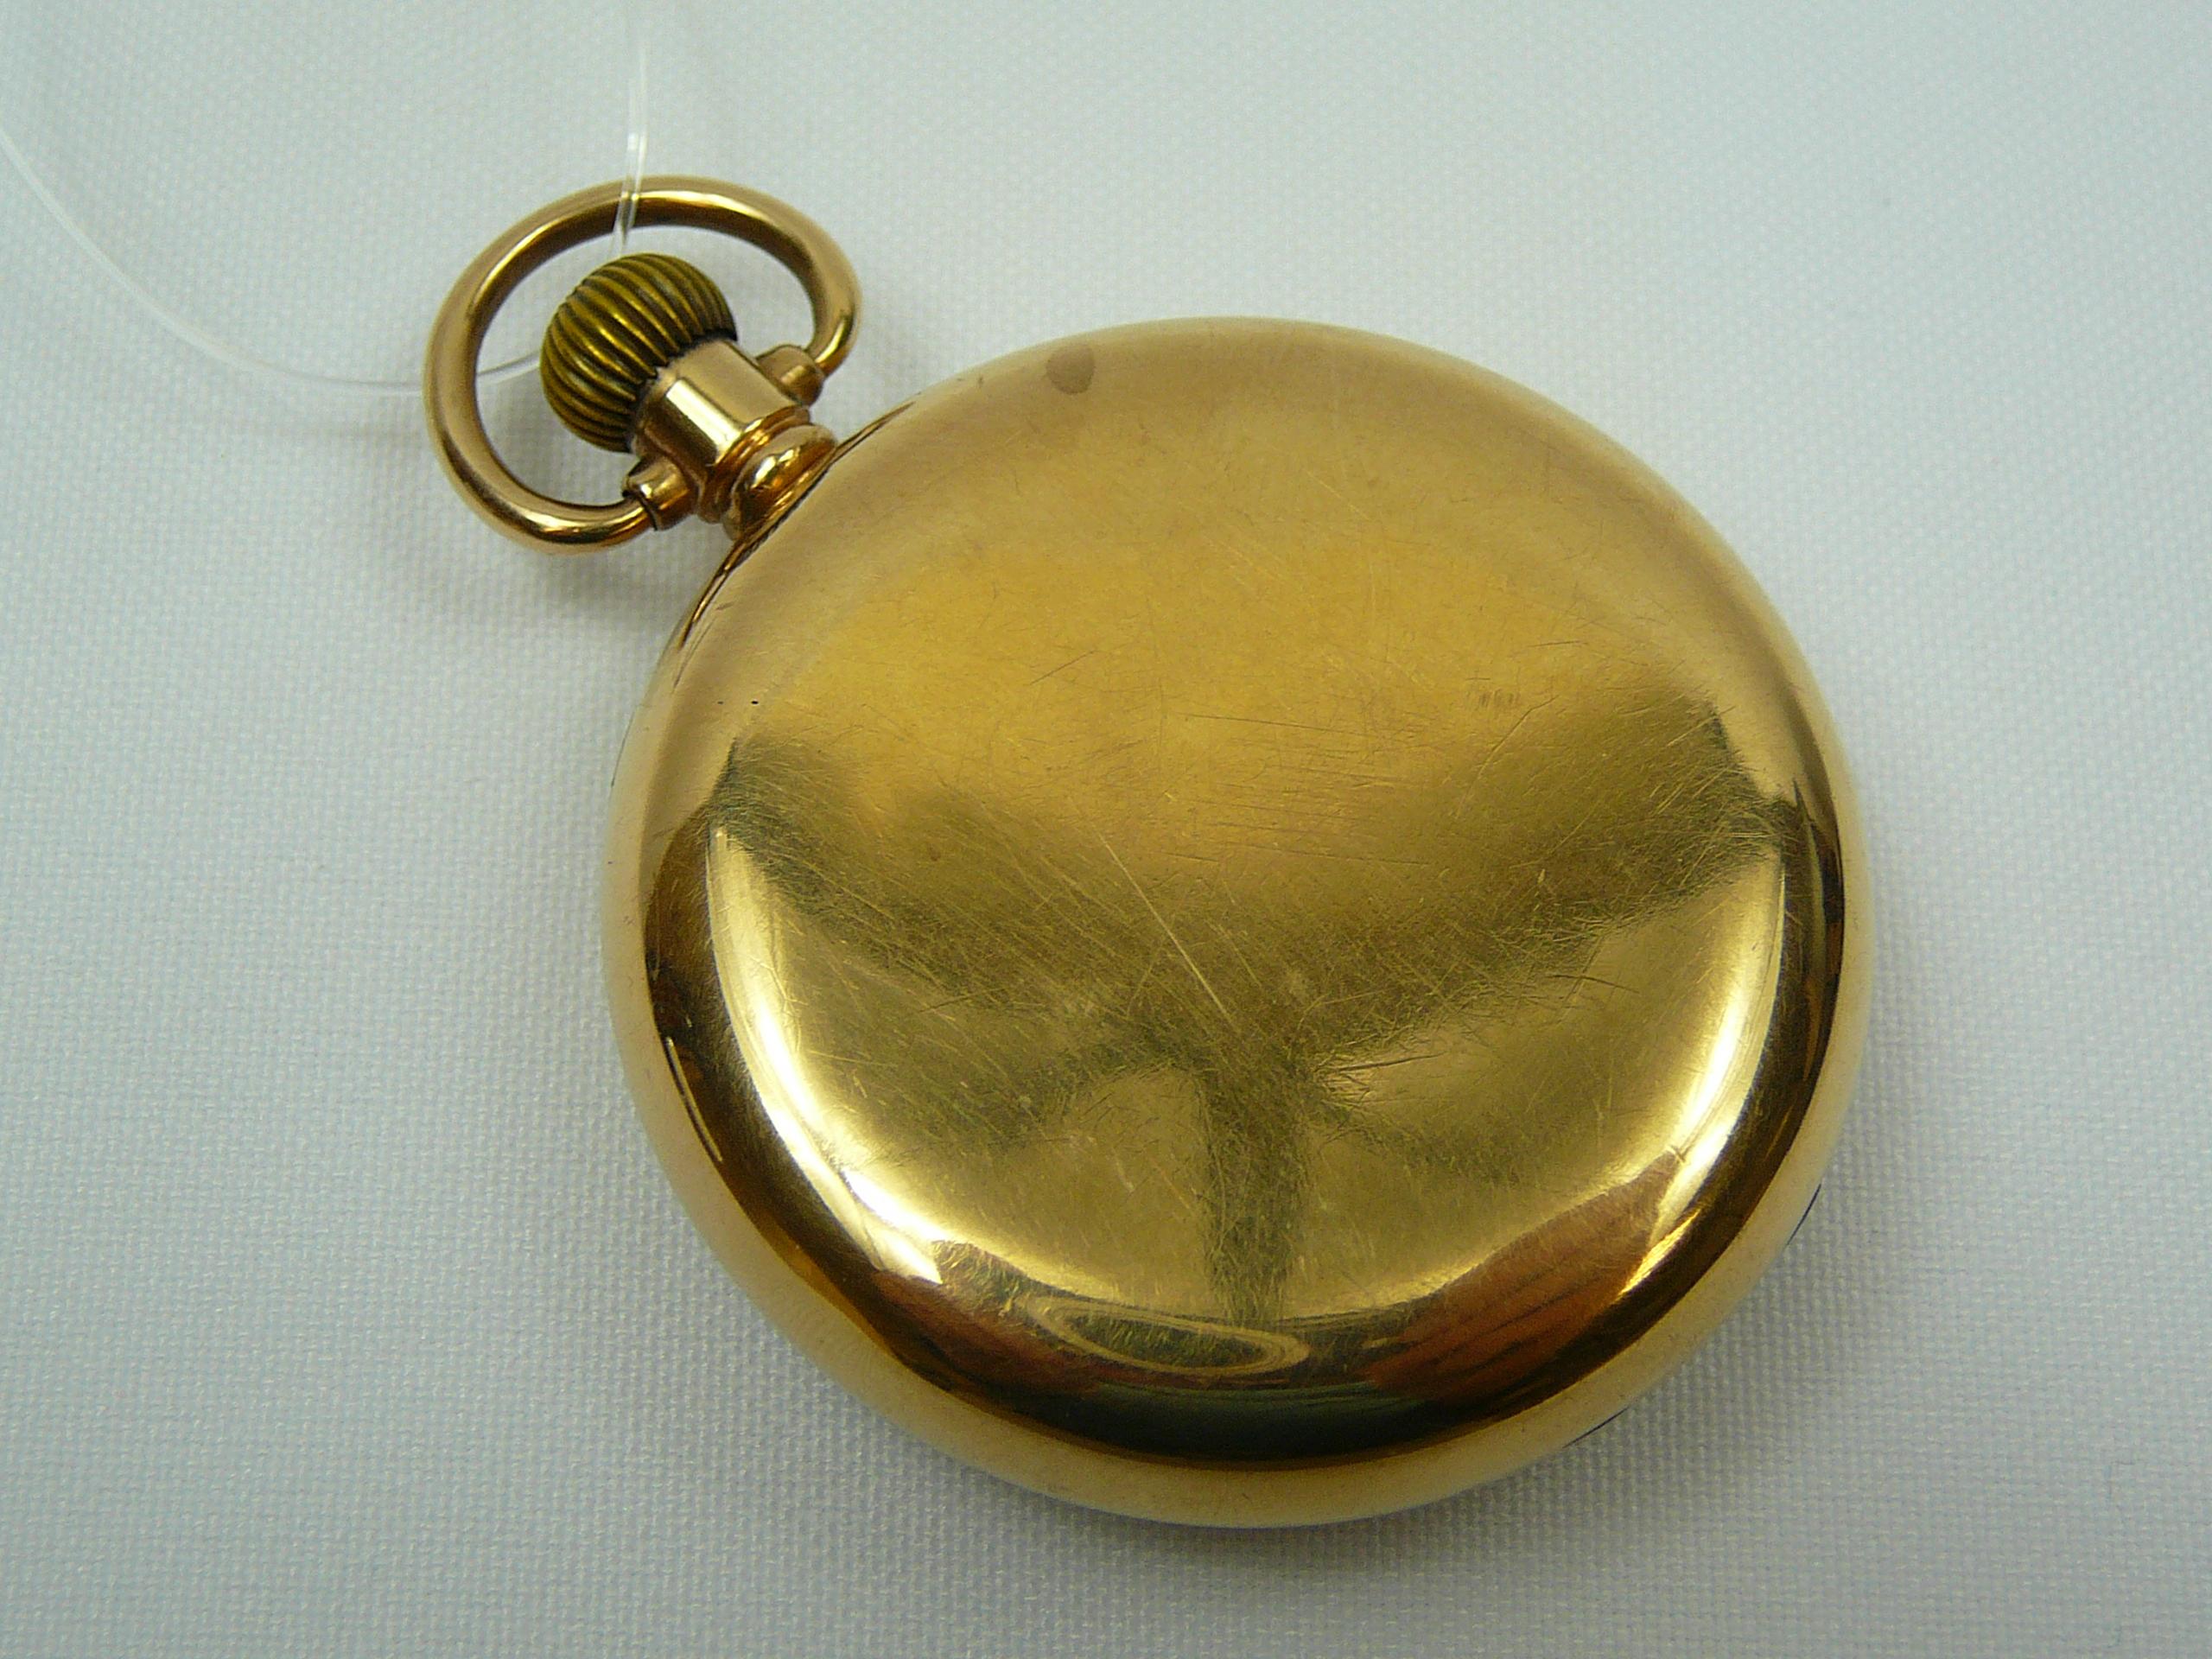 Lot 2 - Gents Gold Pocket Watch